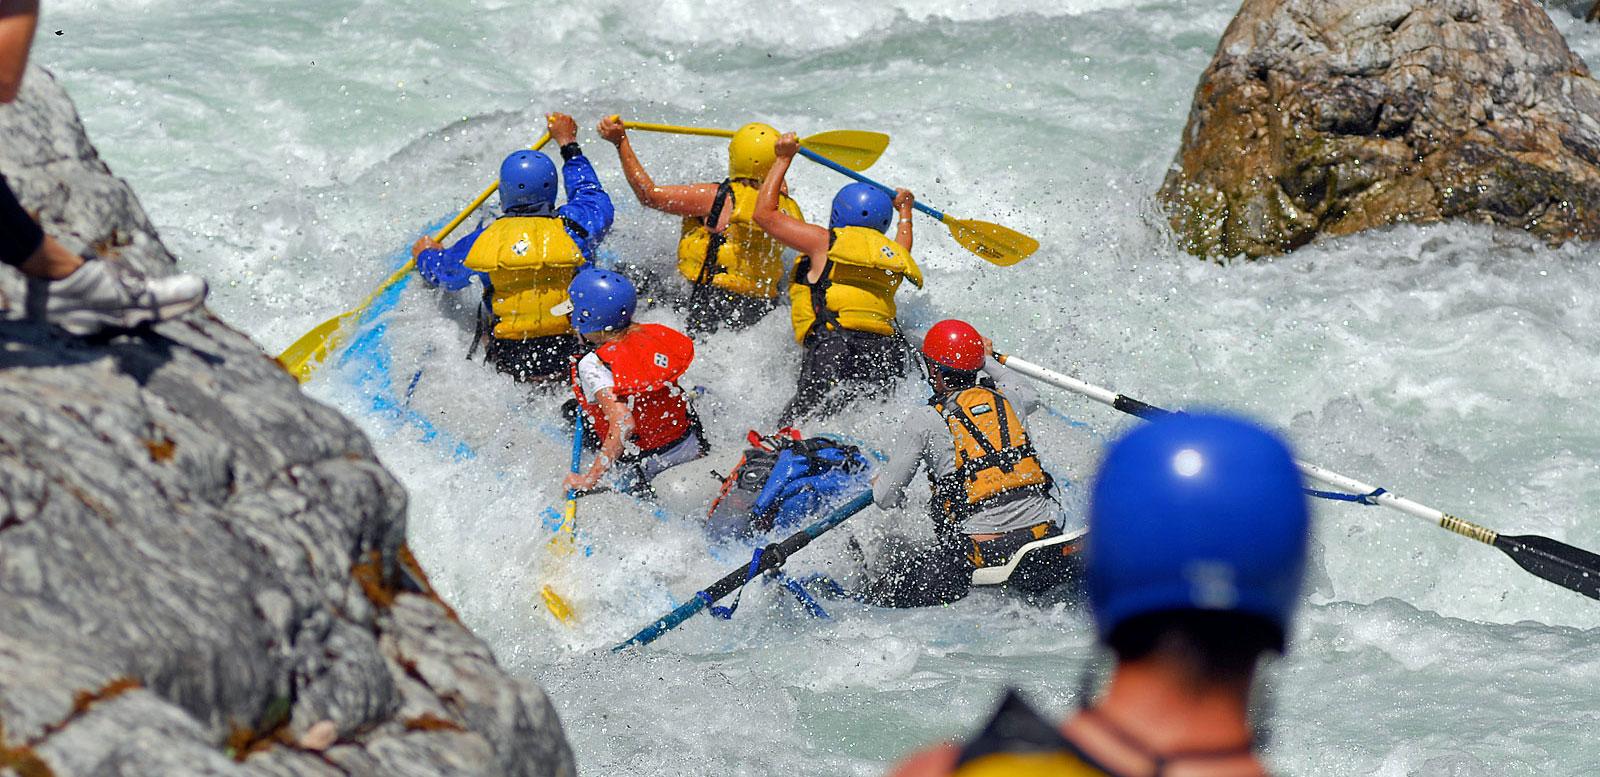 California Salmon Rafting Safari - Cascade Rapid onlooking